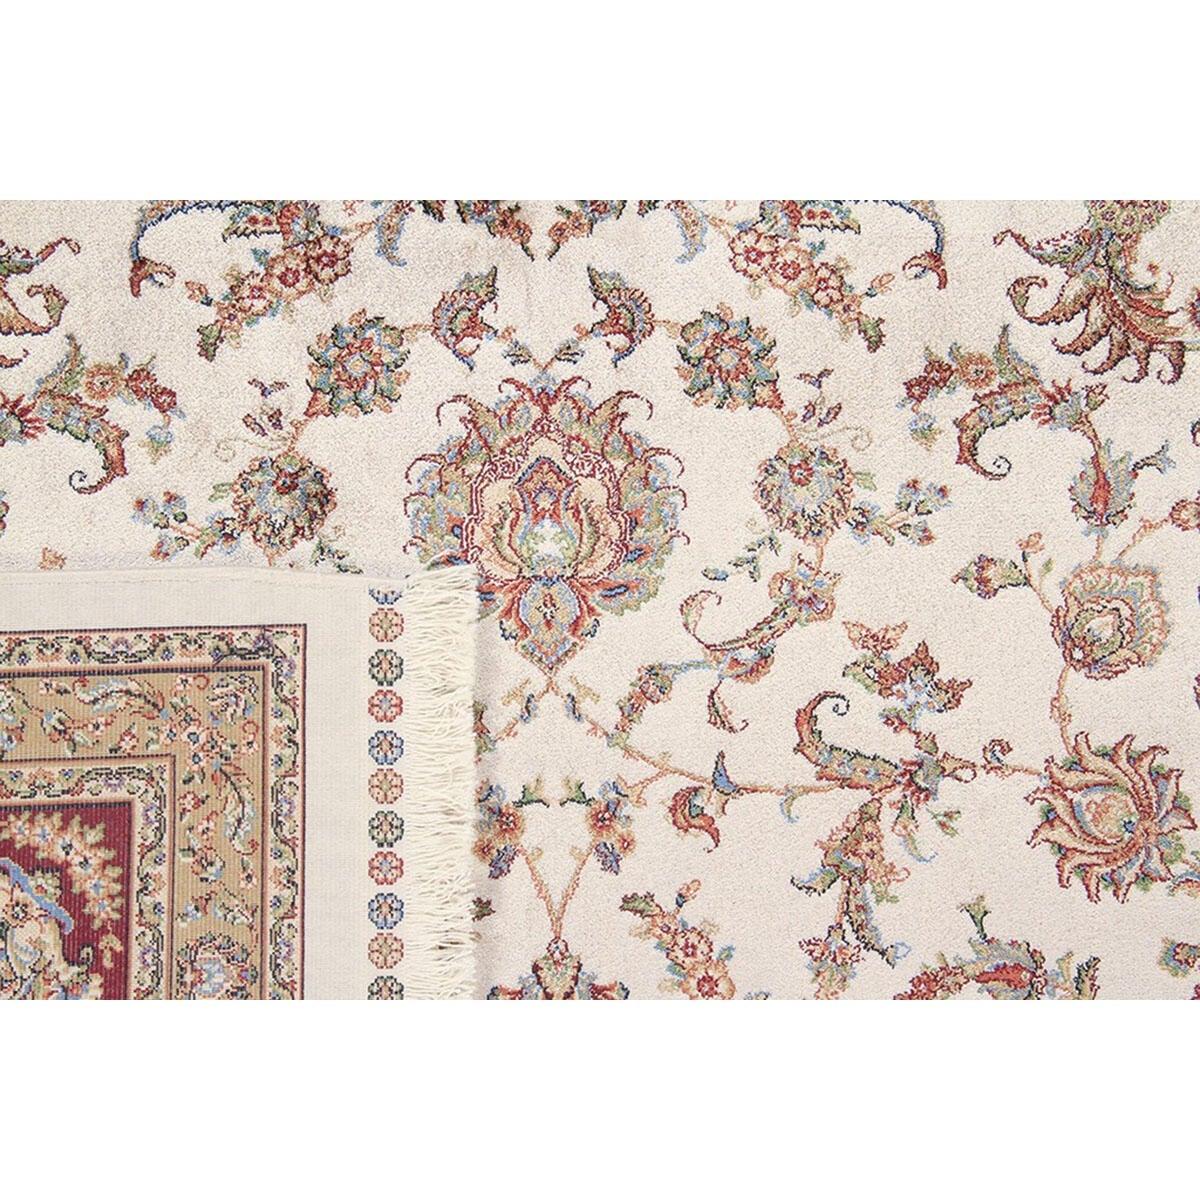 Tappeto Qoum Shah 2 in cotone, beige, 200x300 - 2